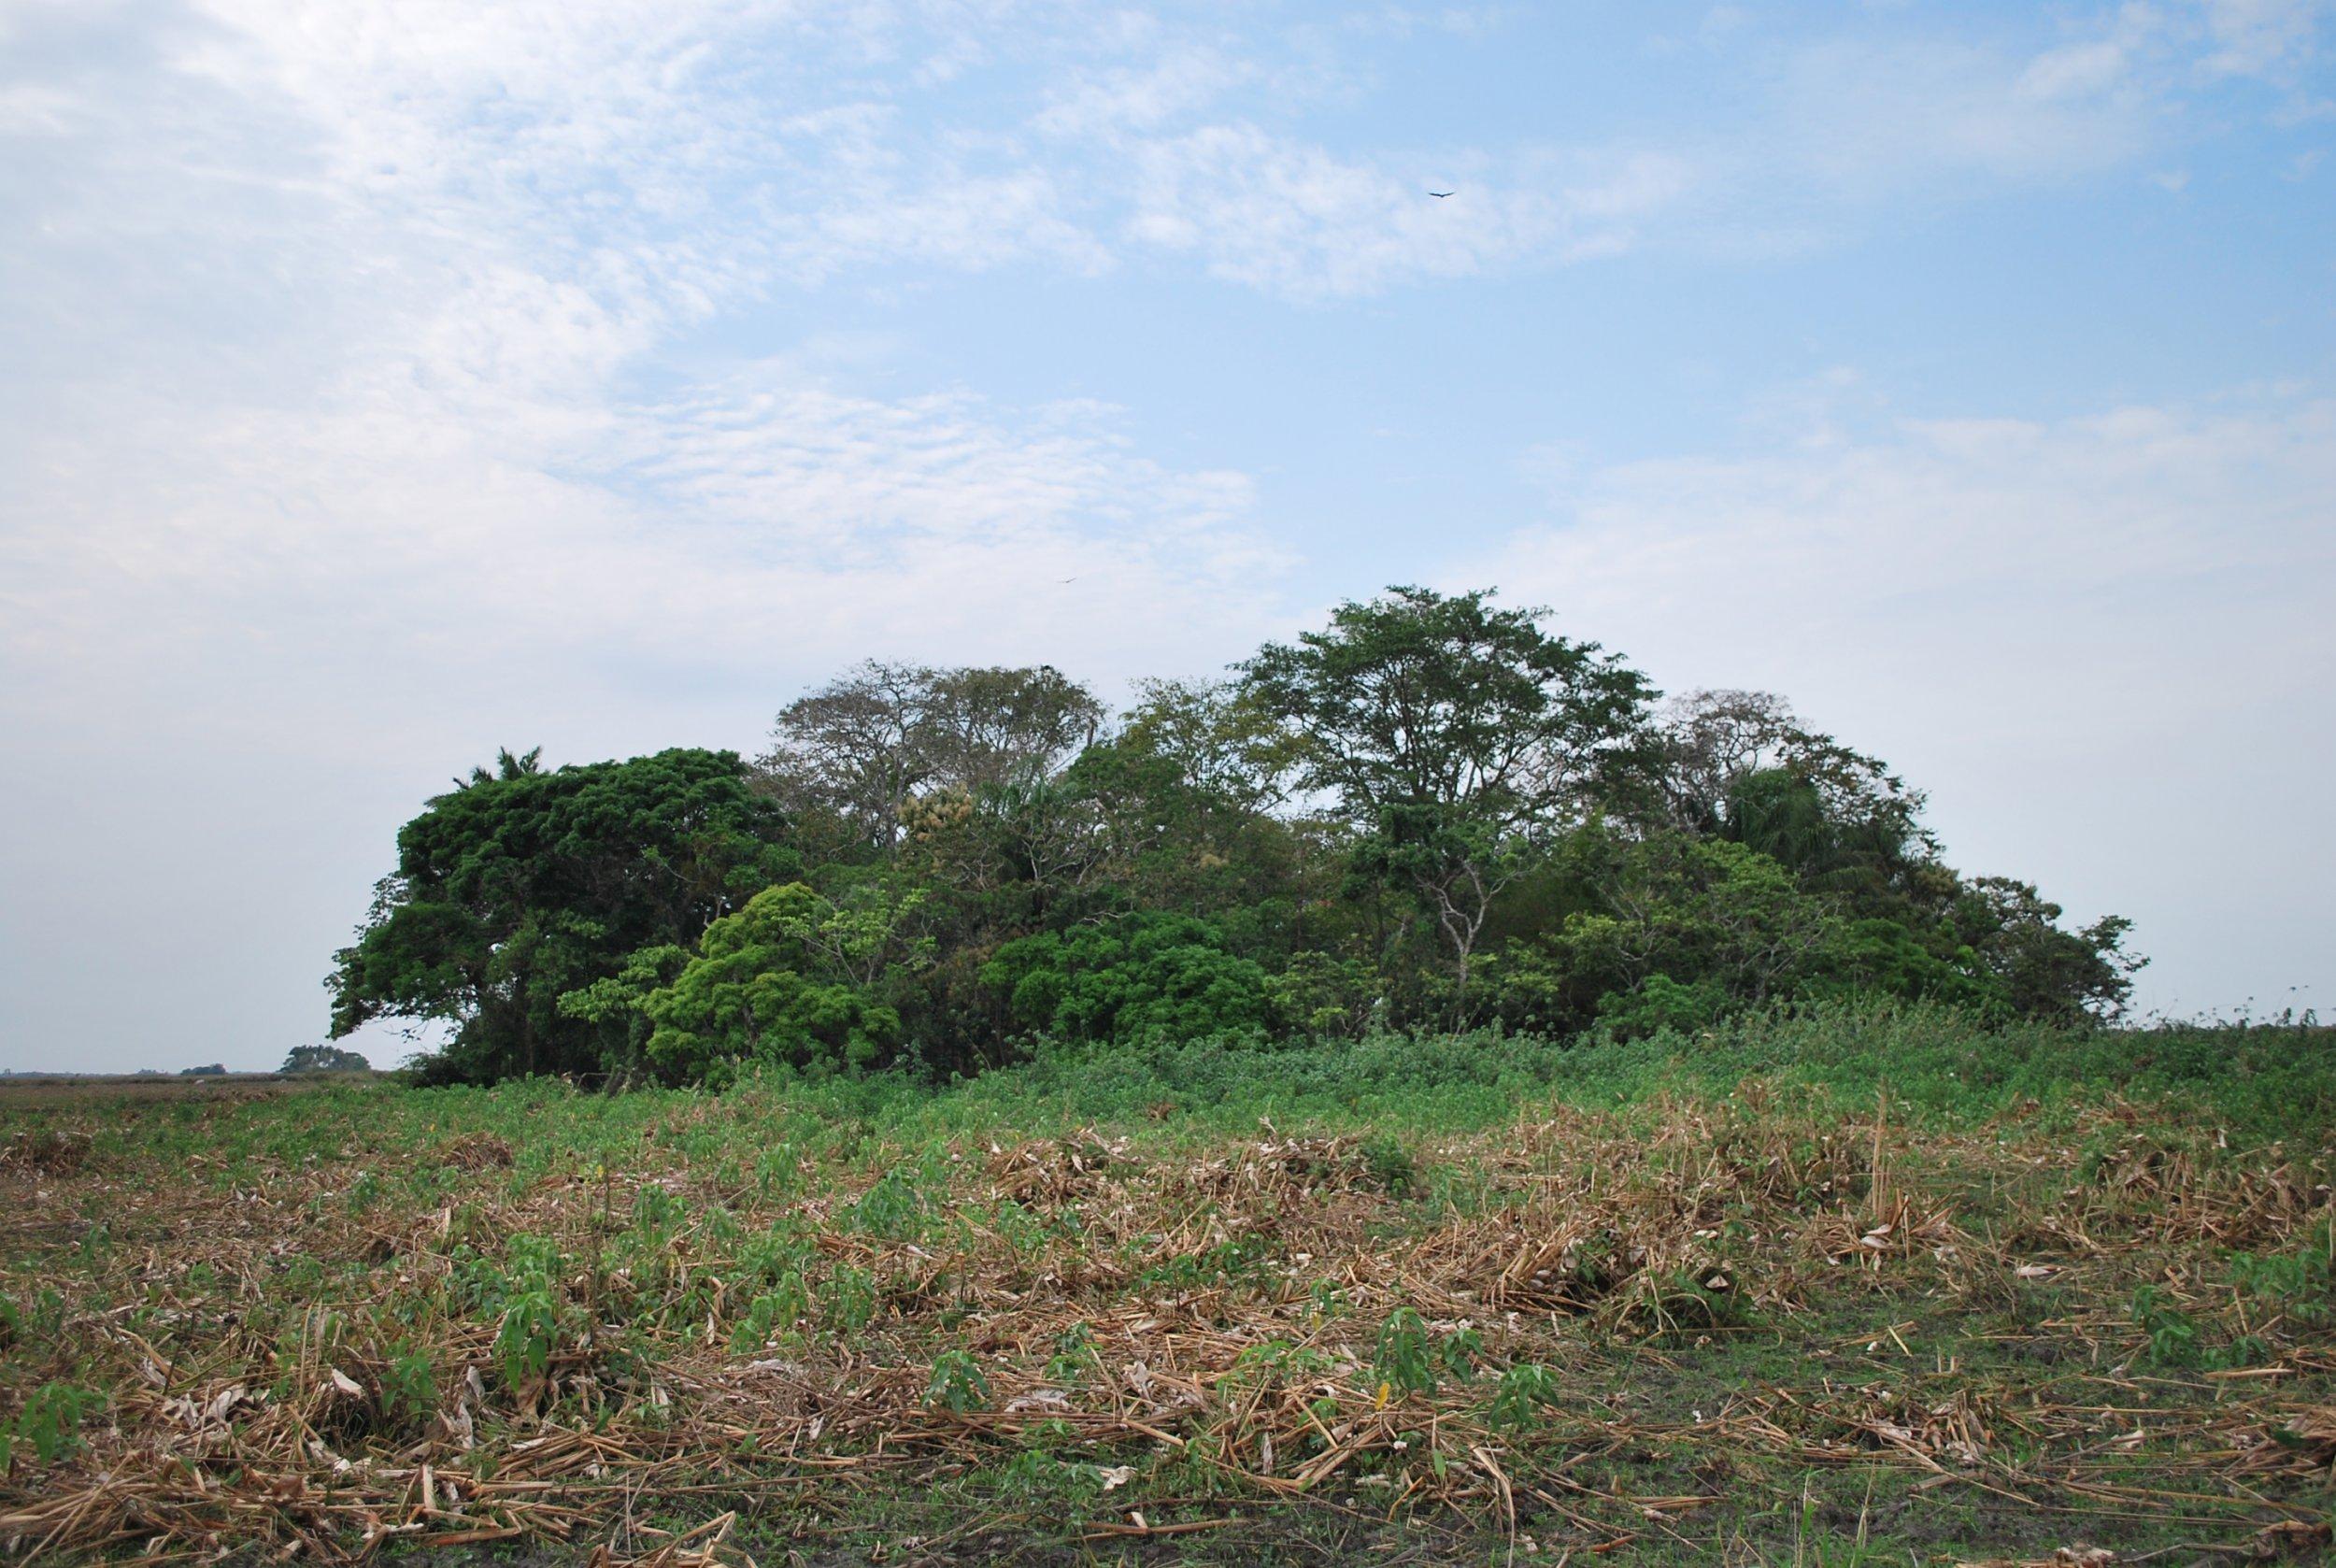 La Chacra forest island, Llanos de Moxos